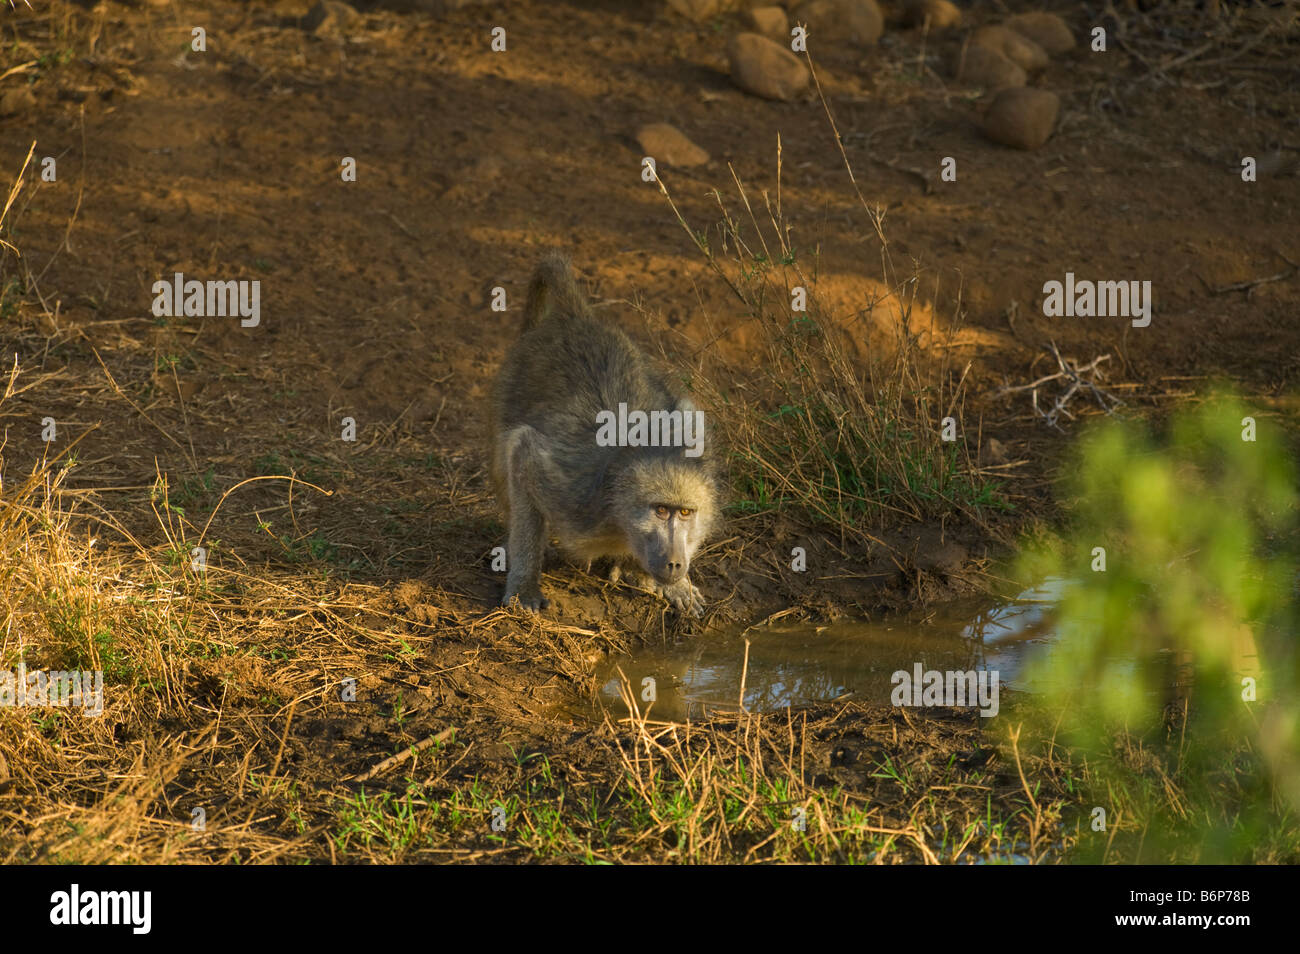 wildlife wild chacma Baboon PAPIO URSINUS primate monkey drink drinking water at waterhole water hole south-Africa - Stock Image